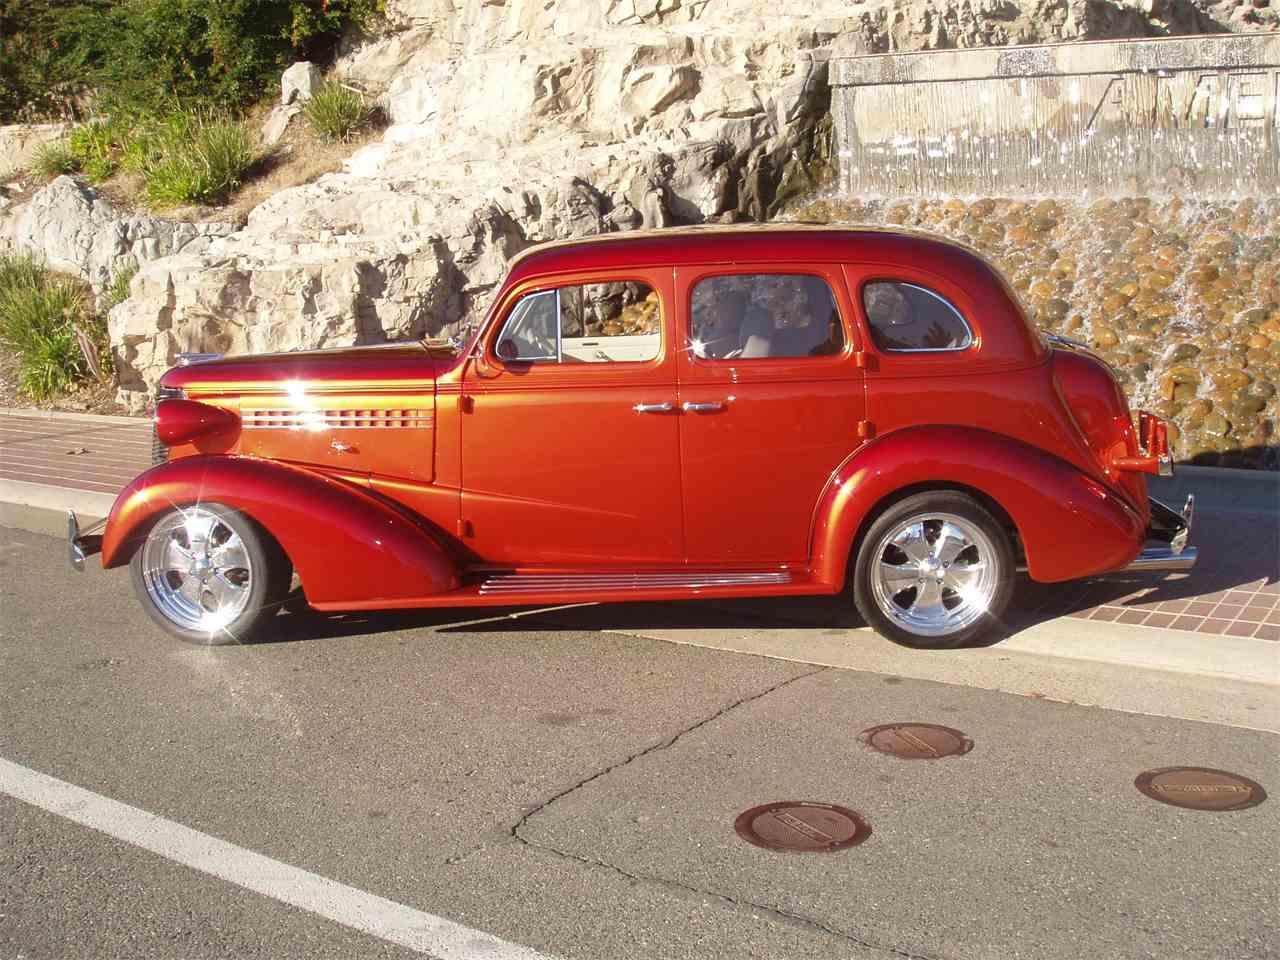 Large Picture of 1938 Chevrolet Sedan located in California - $60,000.00 - K3CQ